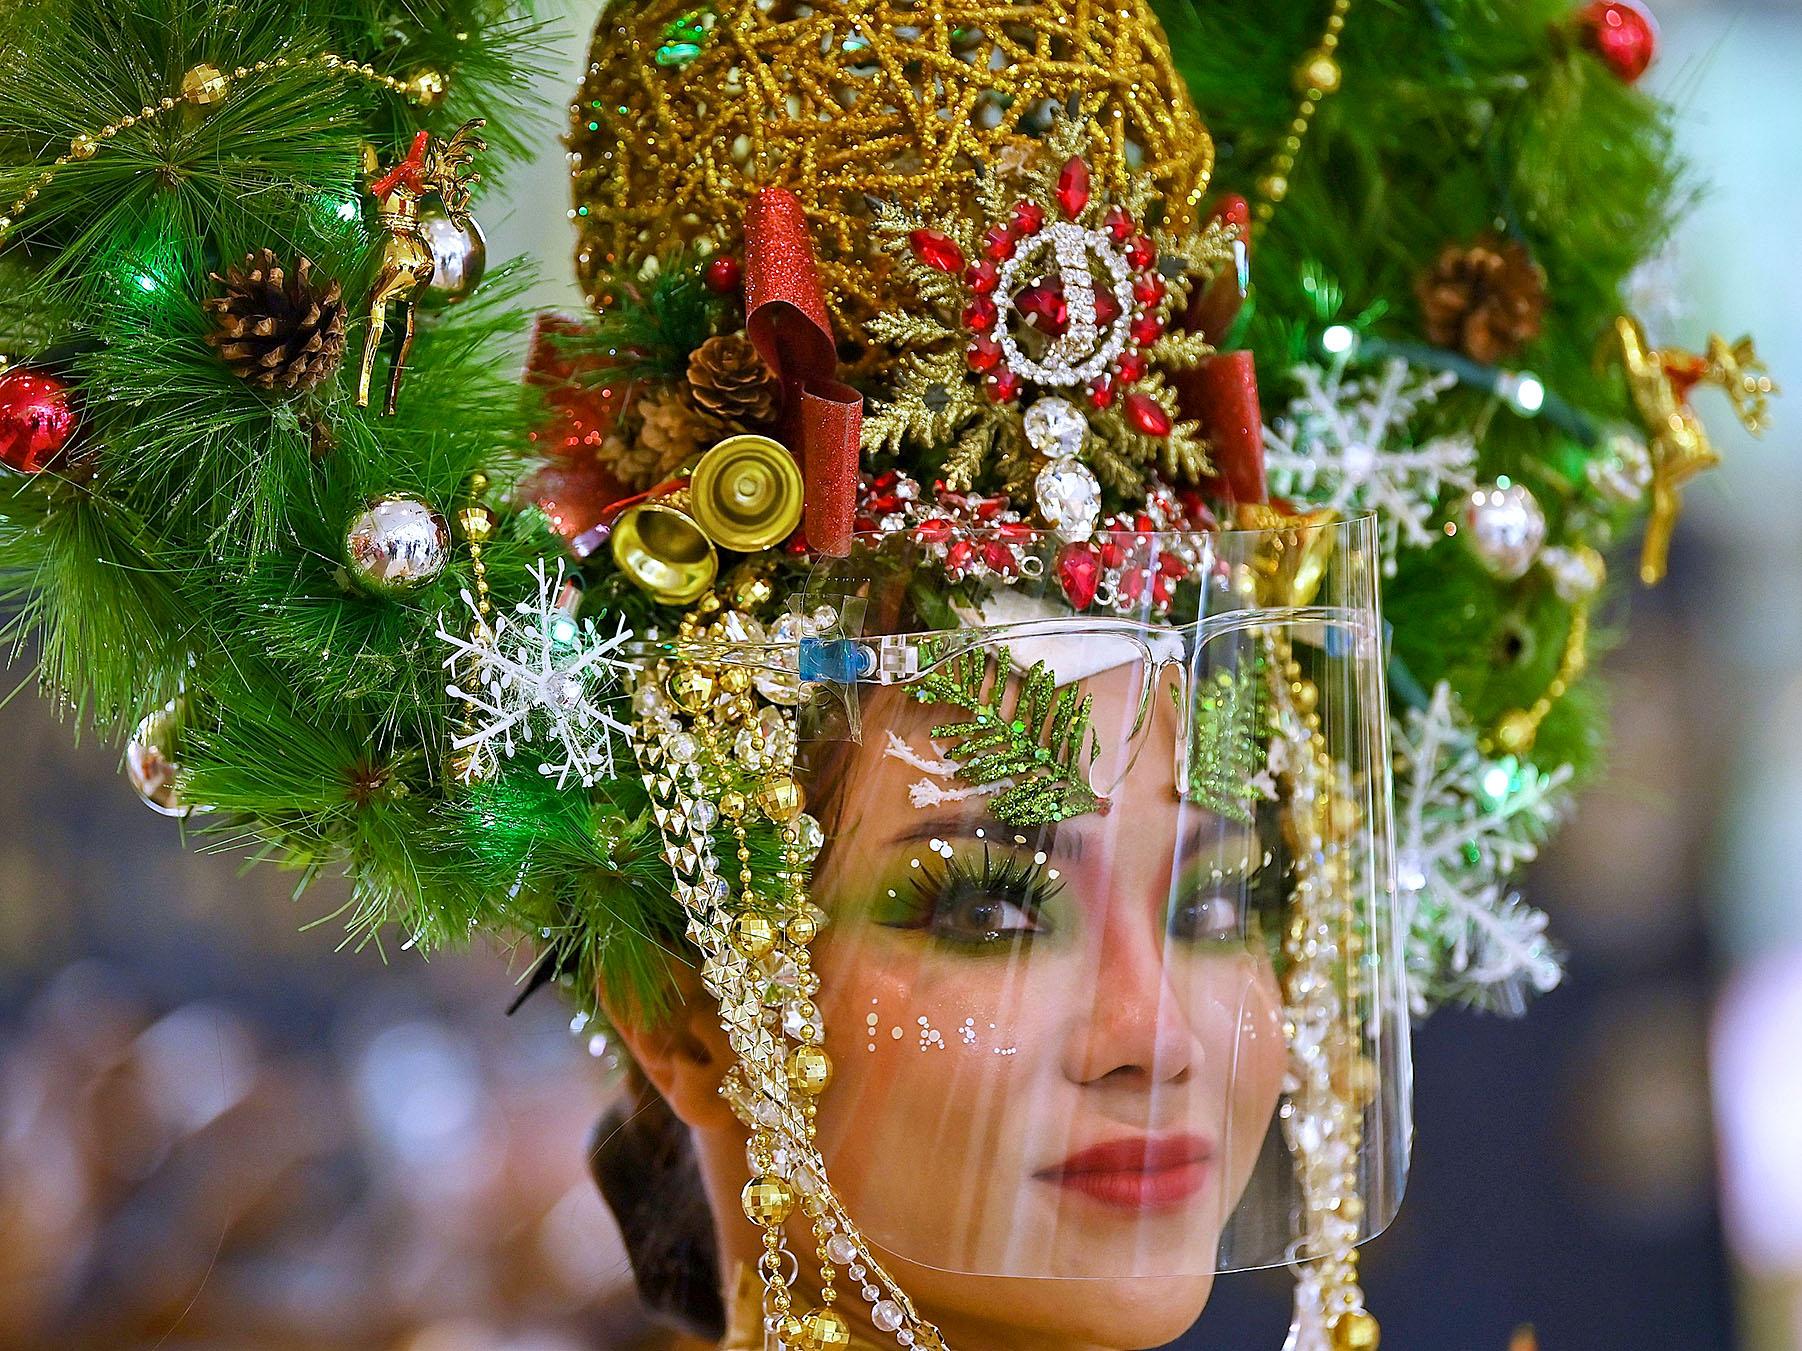 Christmas tree model in Bangkok by Lillian Suwanrumpha.jpg